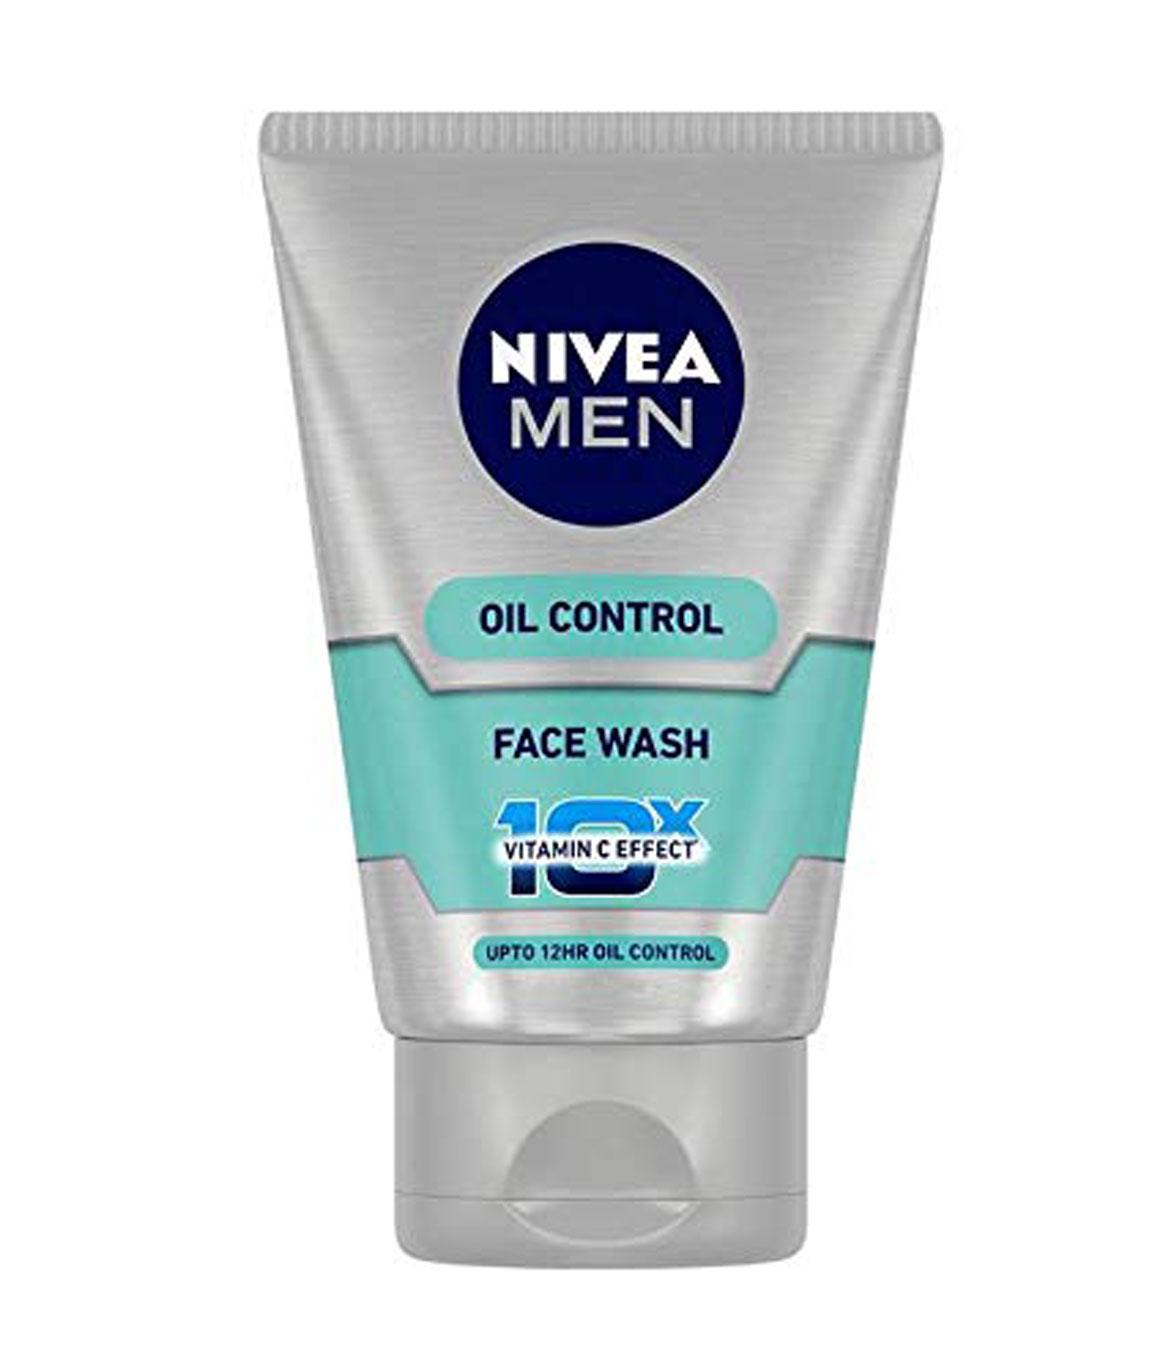 Nivea Men Oil Control 10x Whitening Face Wash, 100gm